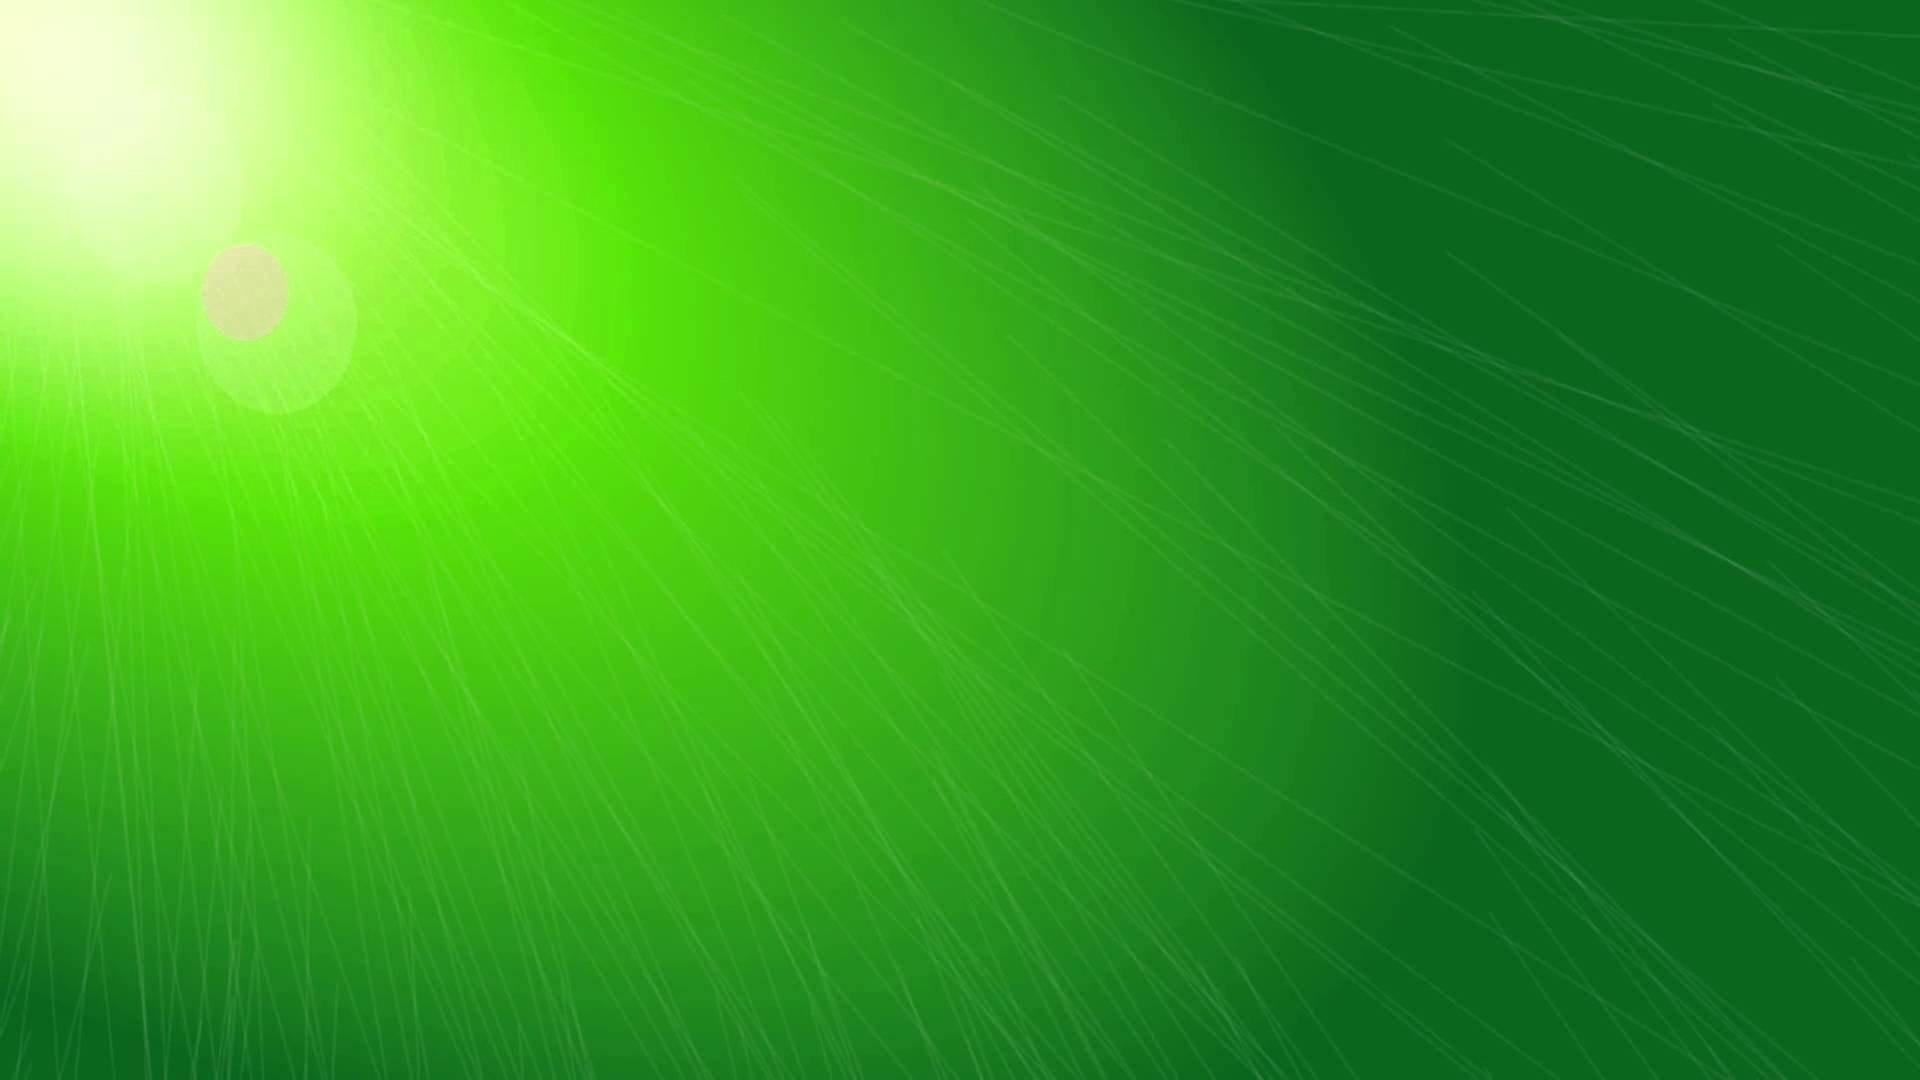 Spark Green HD Wallpaper